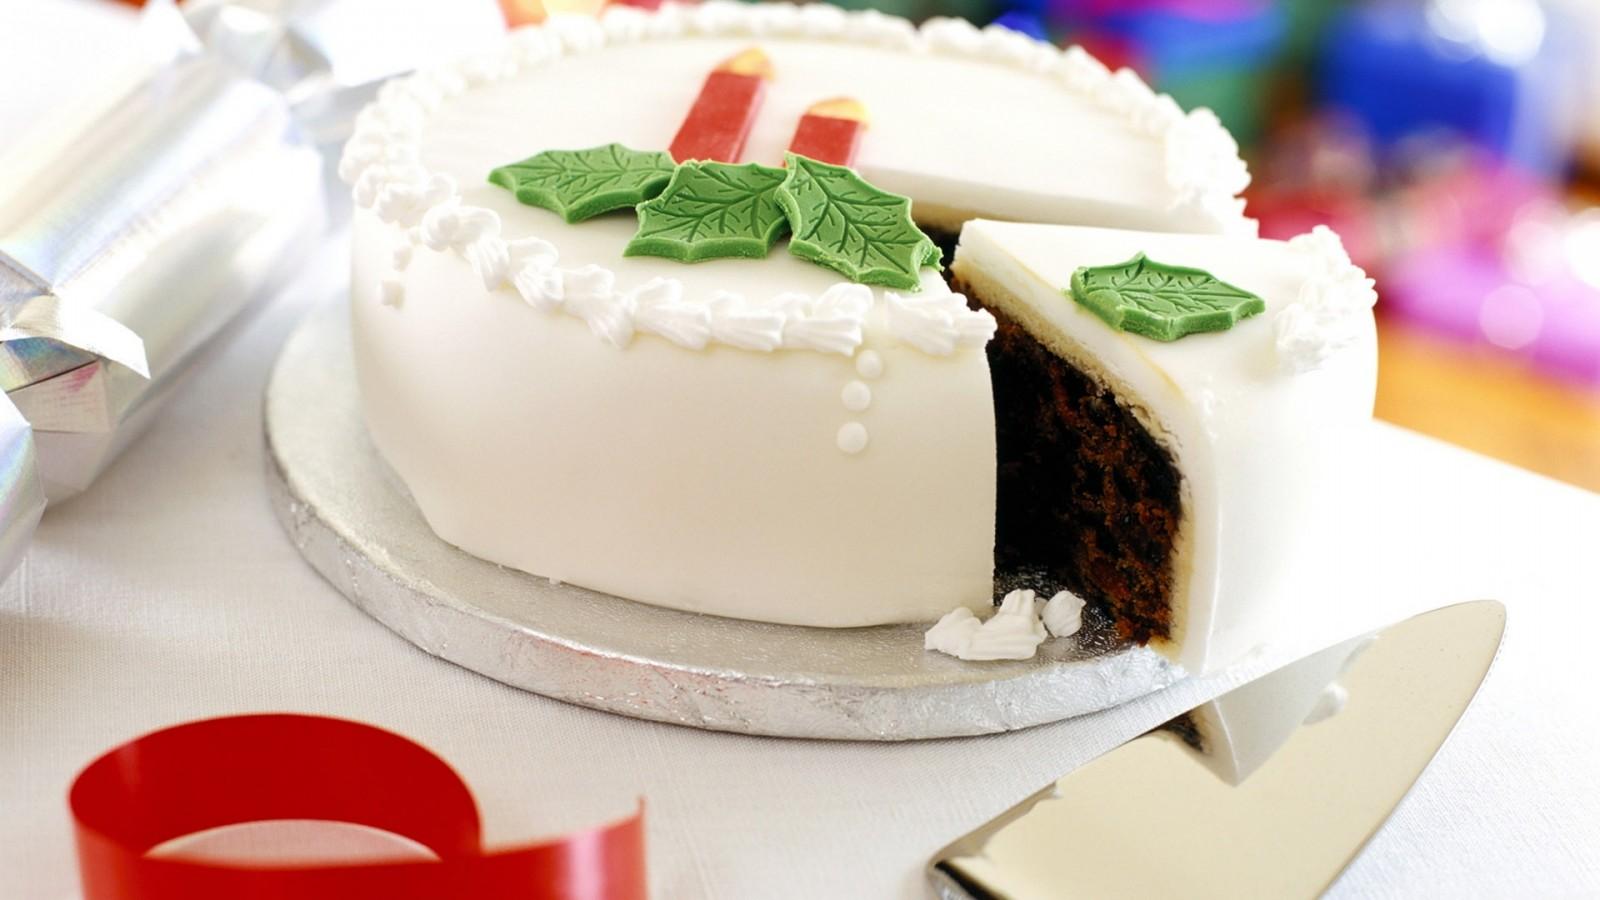 cake wallpaper hd,food,dish,dessert,cuisine,ingredient